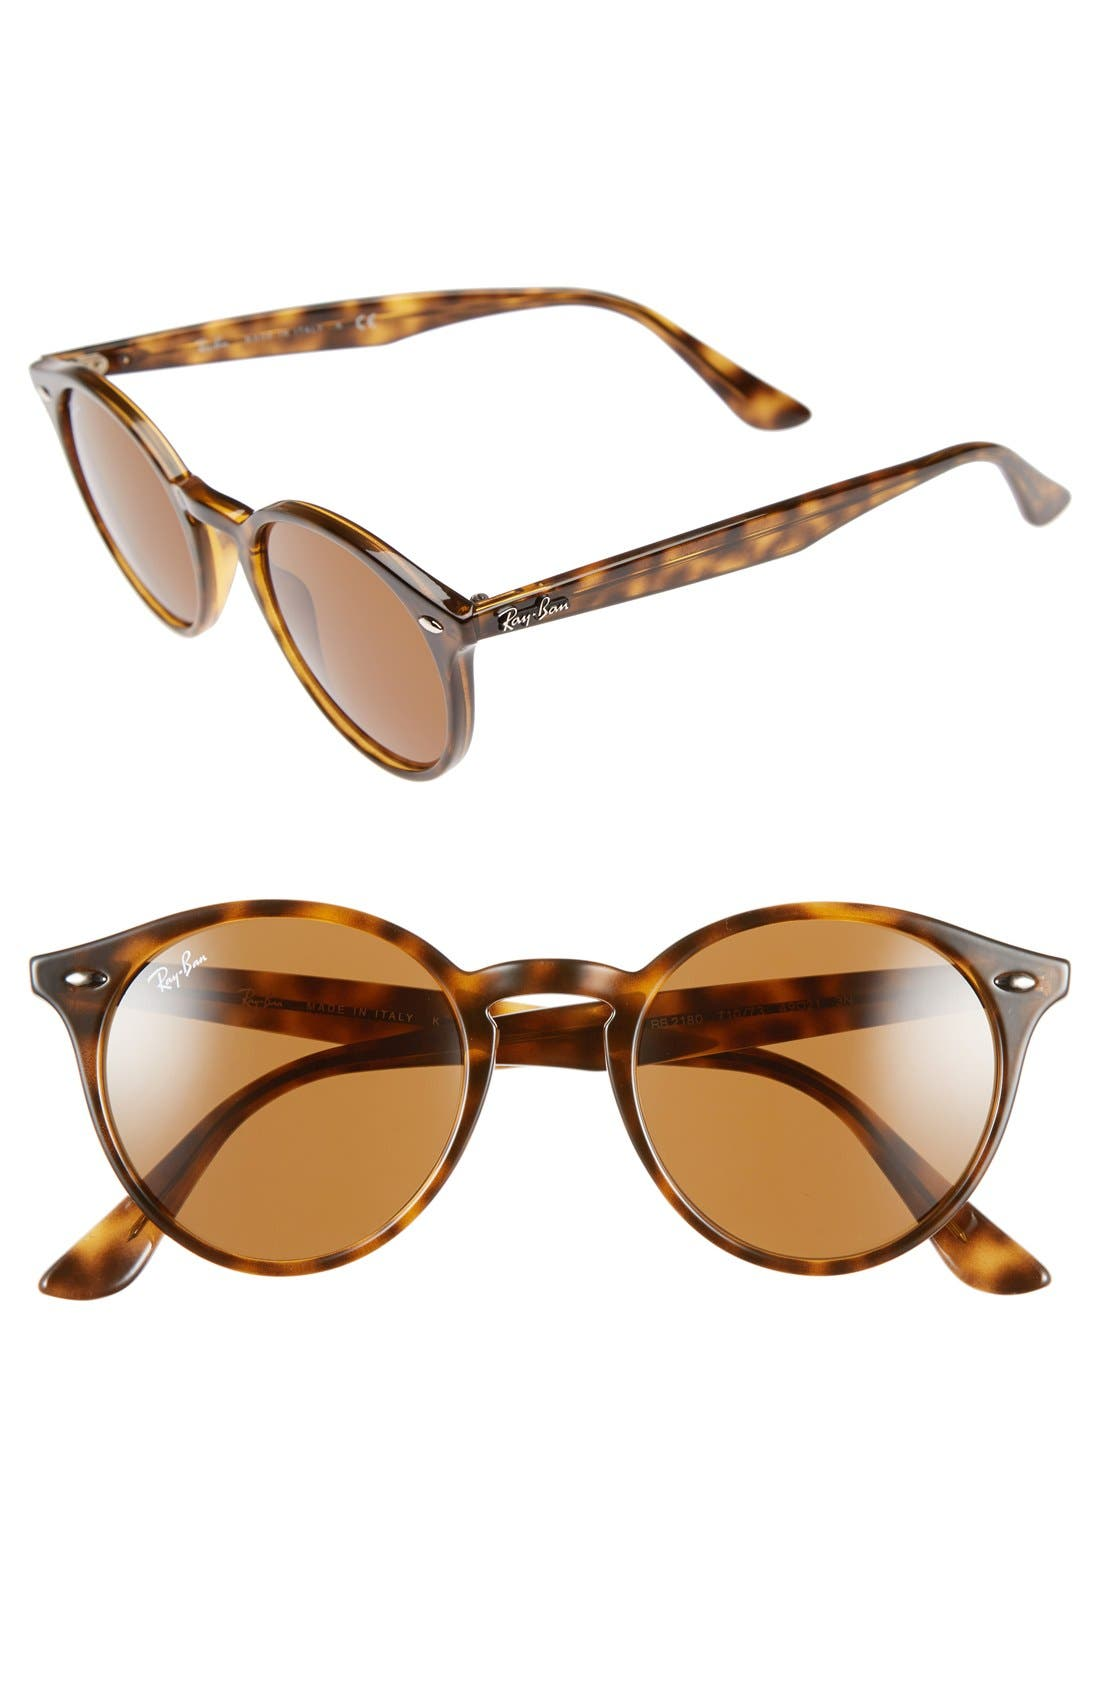 Ray-Ban 49mm Round Sunglasses